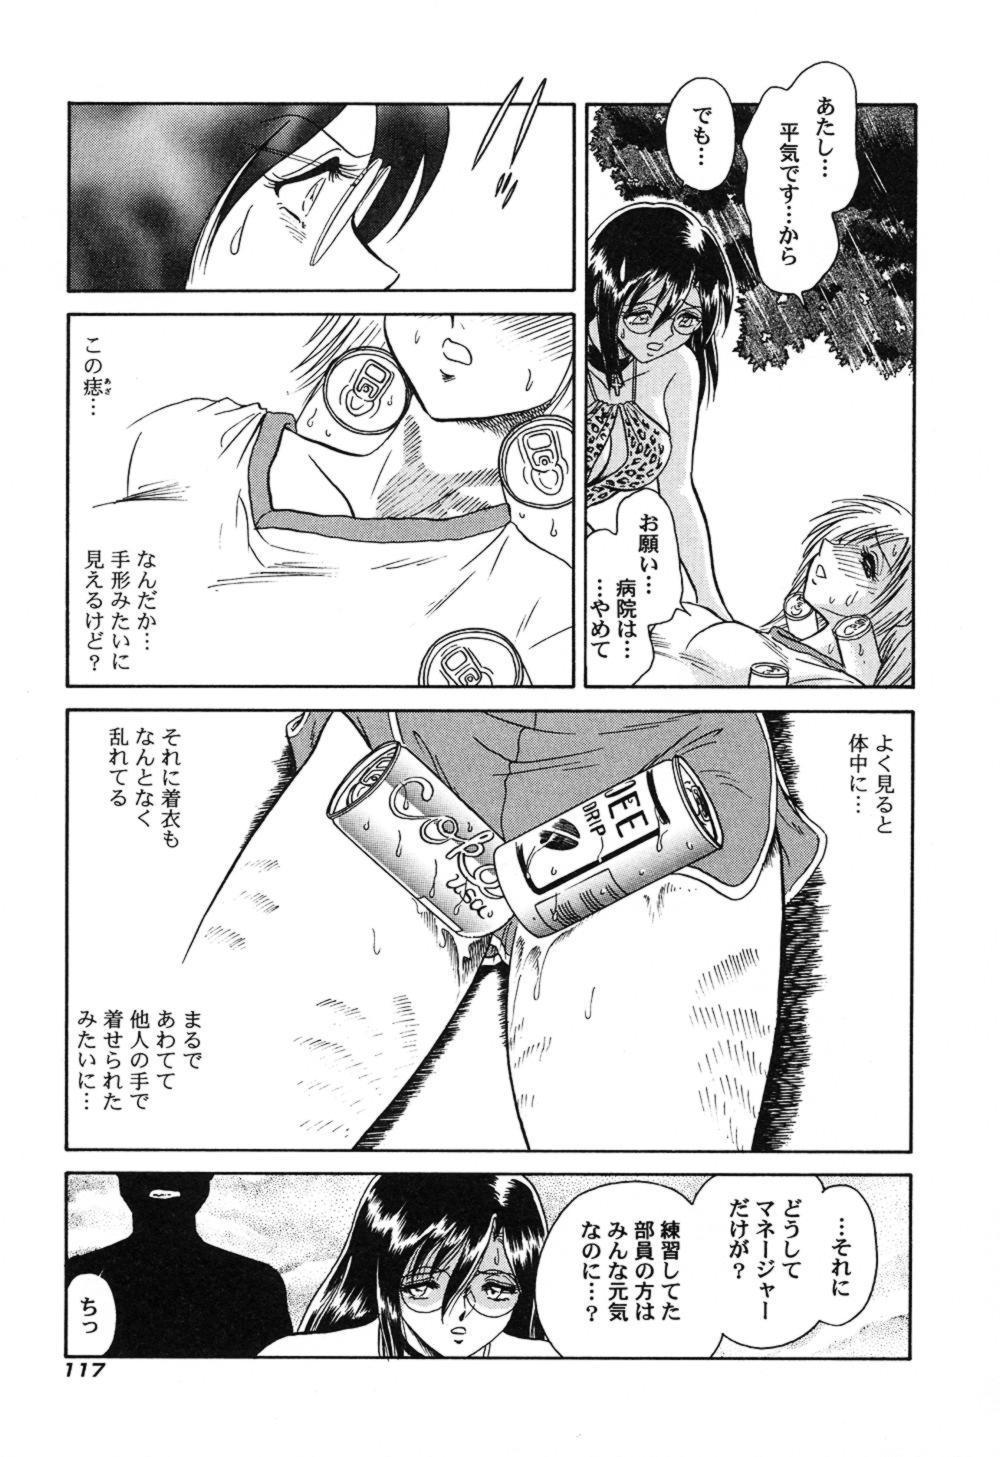 Hageshii Kagai Jugyou 119